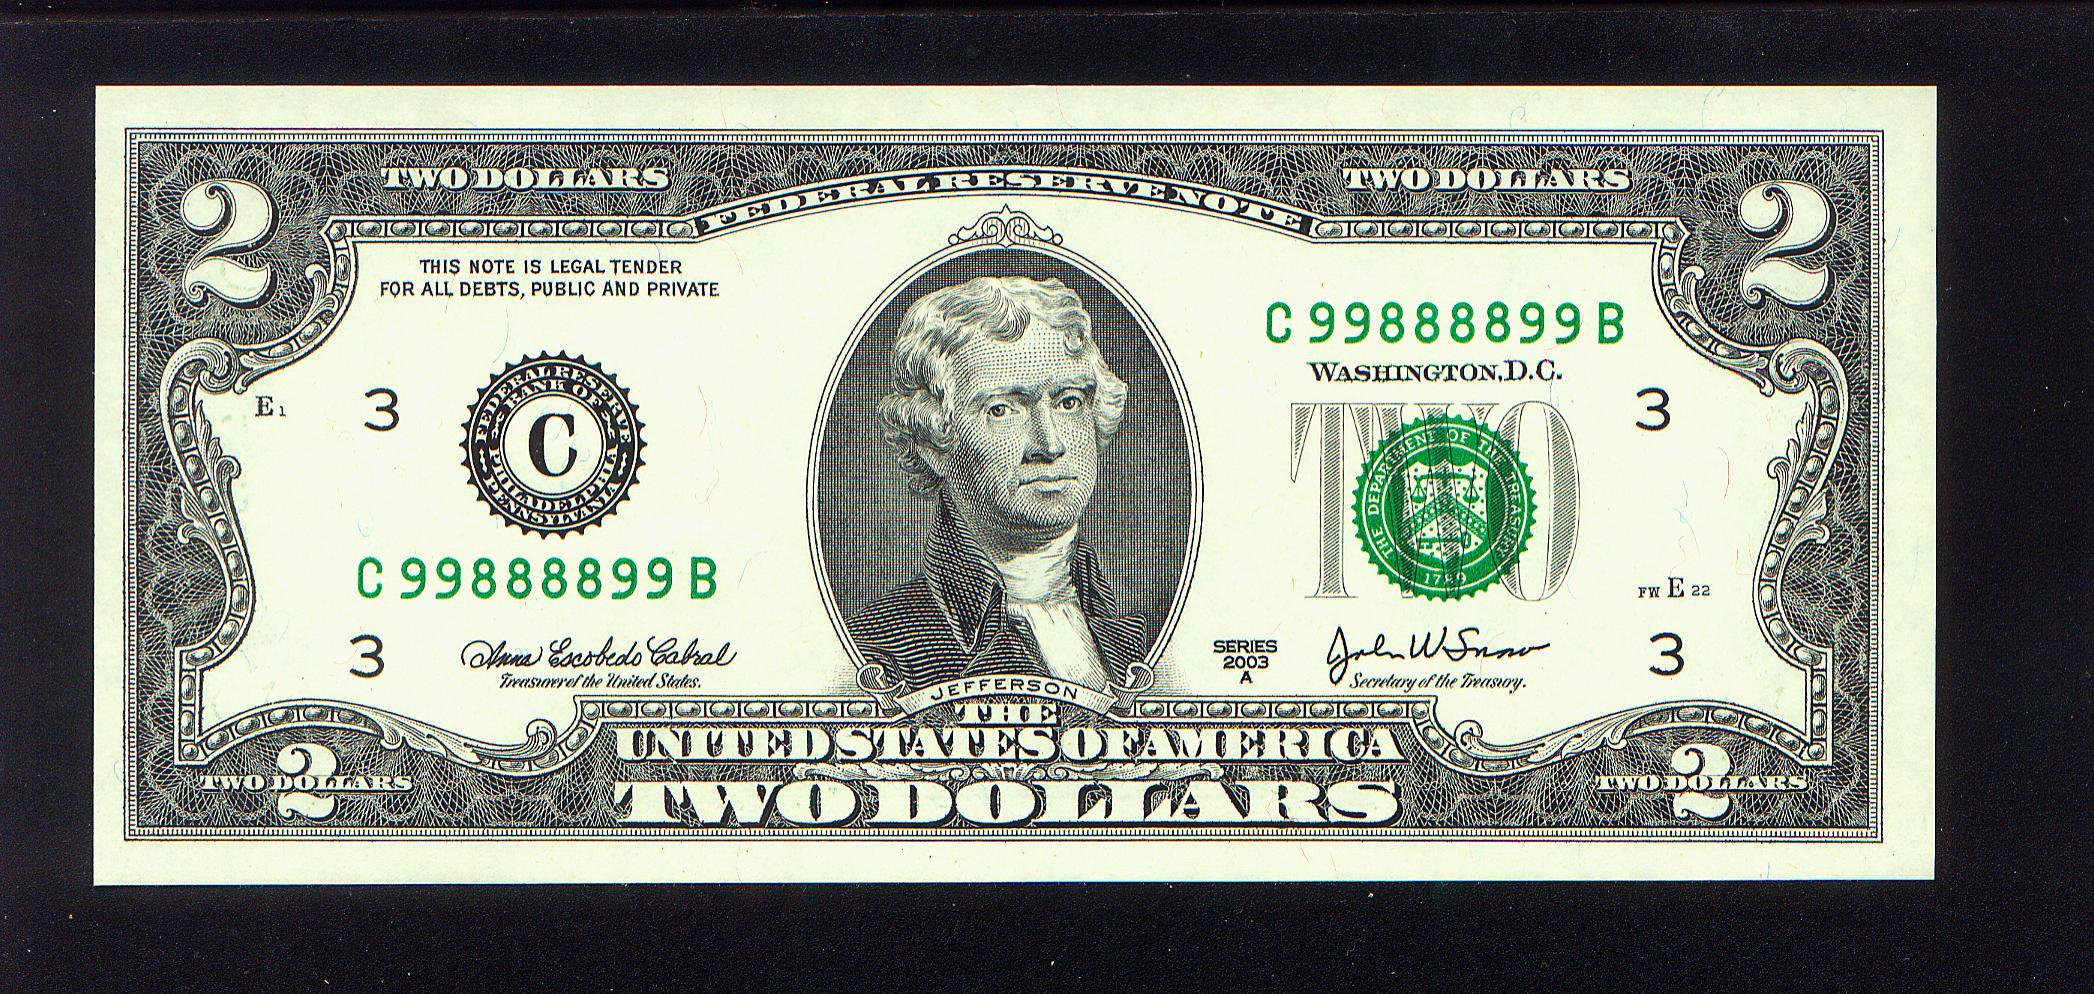 2003a $2 99888899.jpg